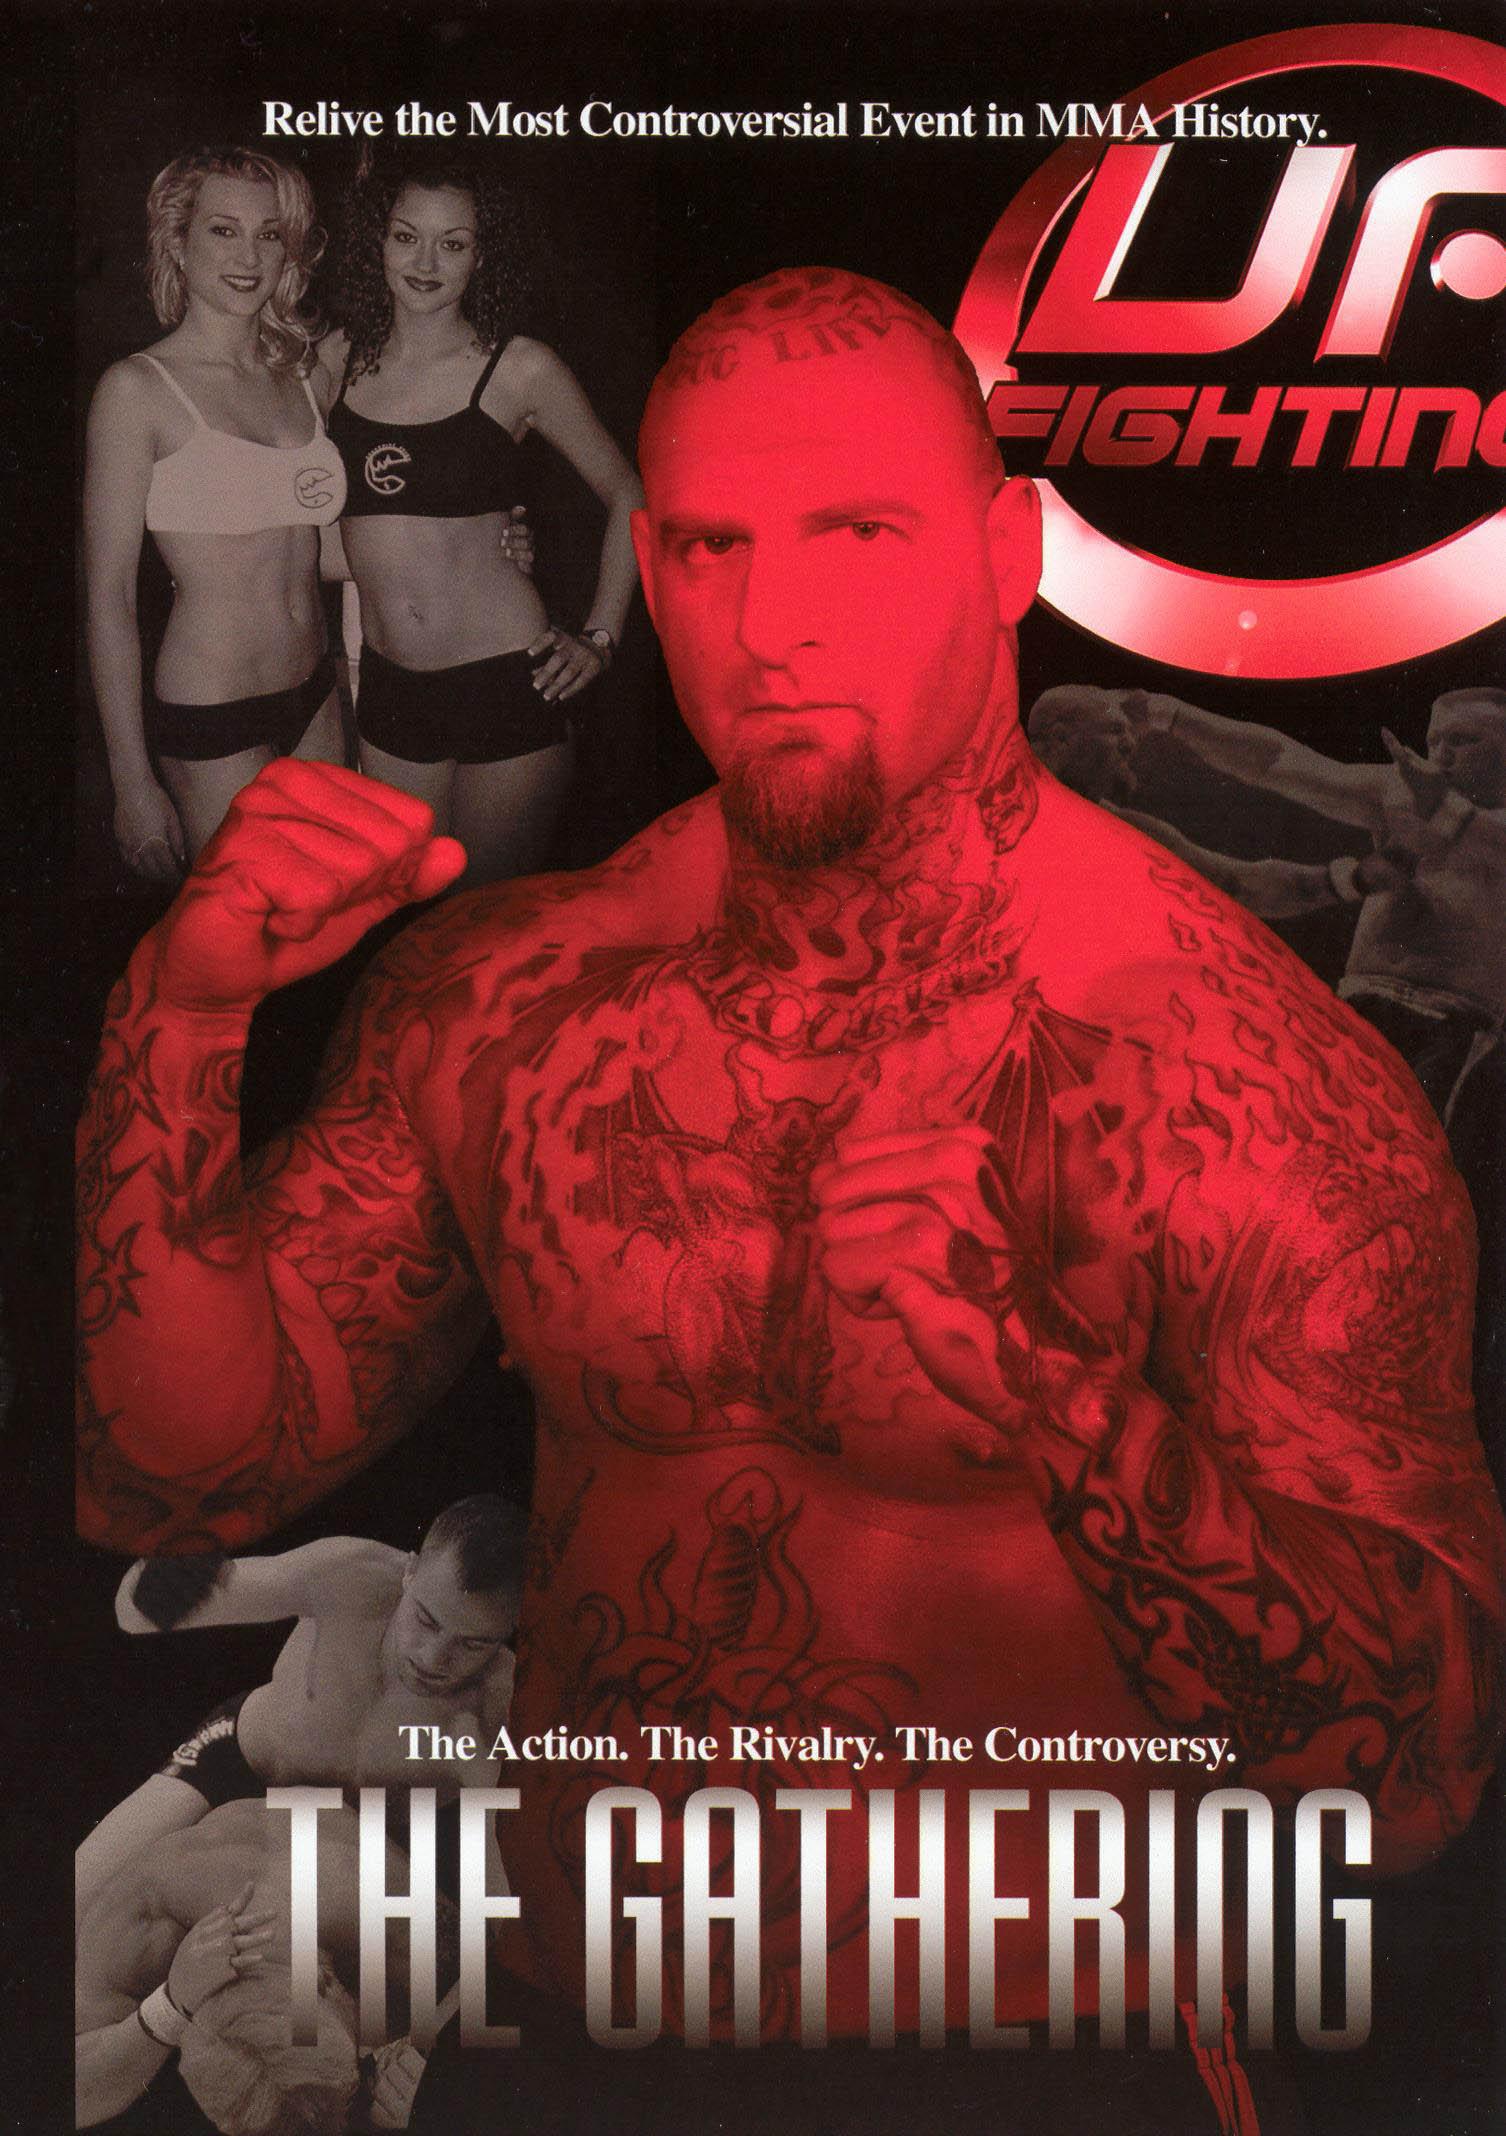 Ultimate Athlete Fighting II: The Gathering